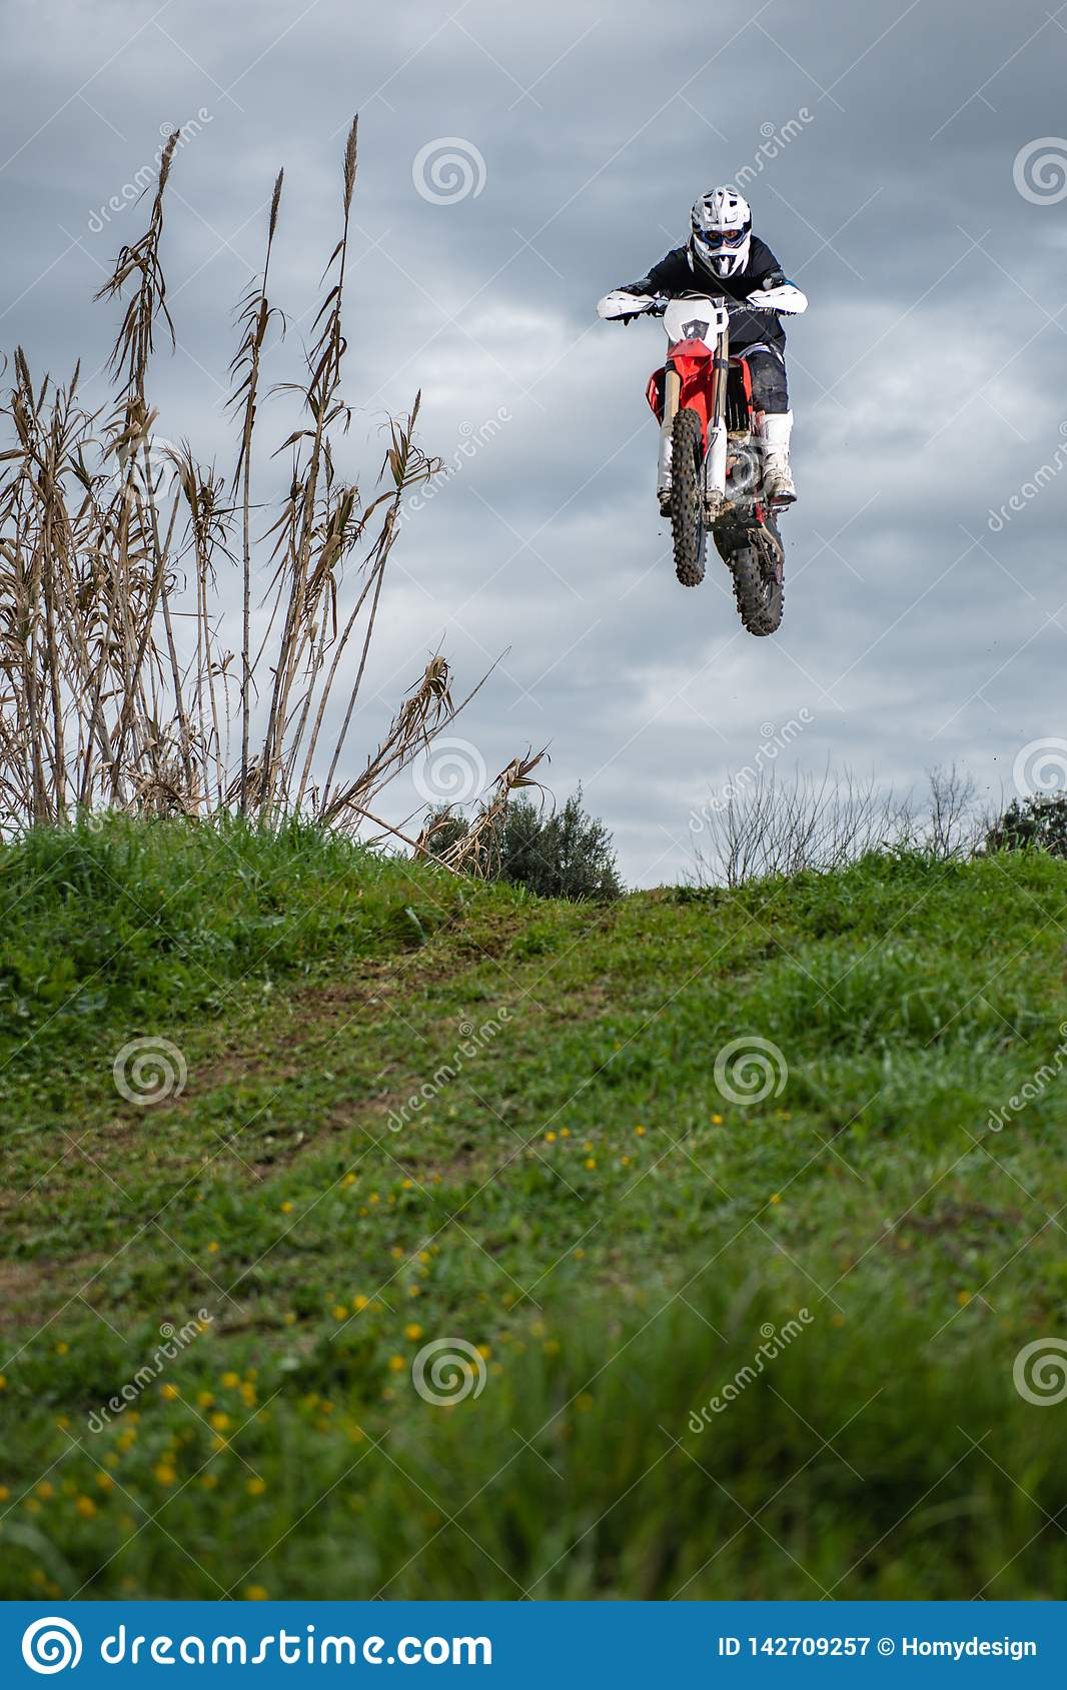 Motocross Race Mud Rider stock photo. Image of leader